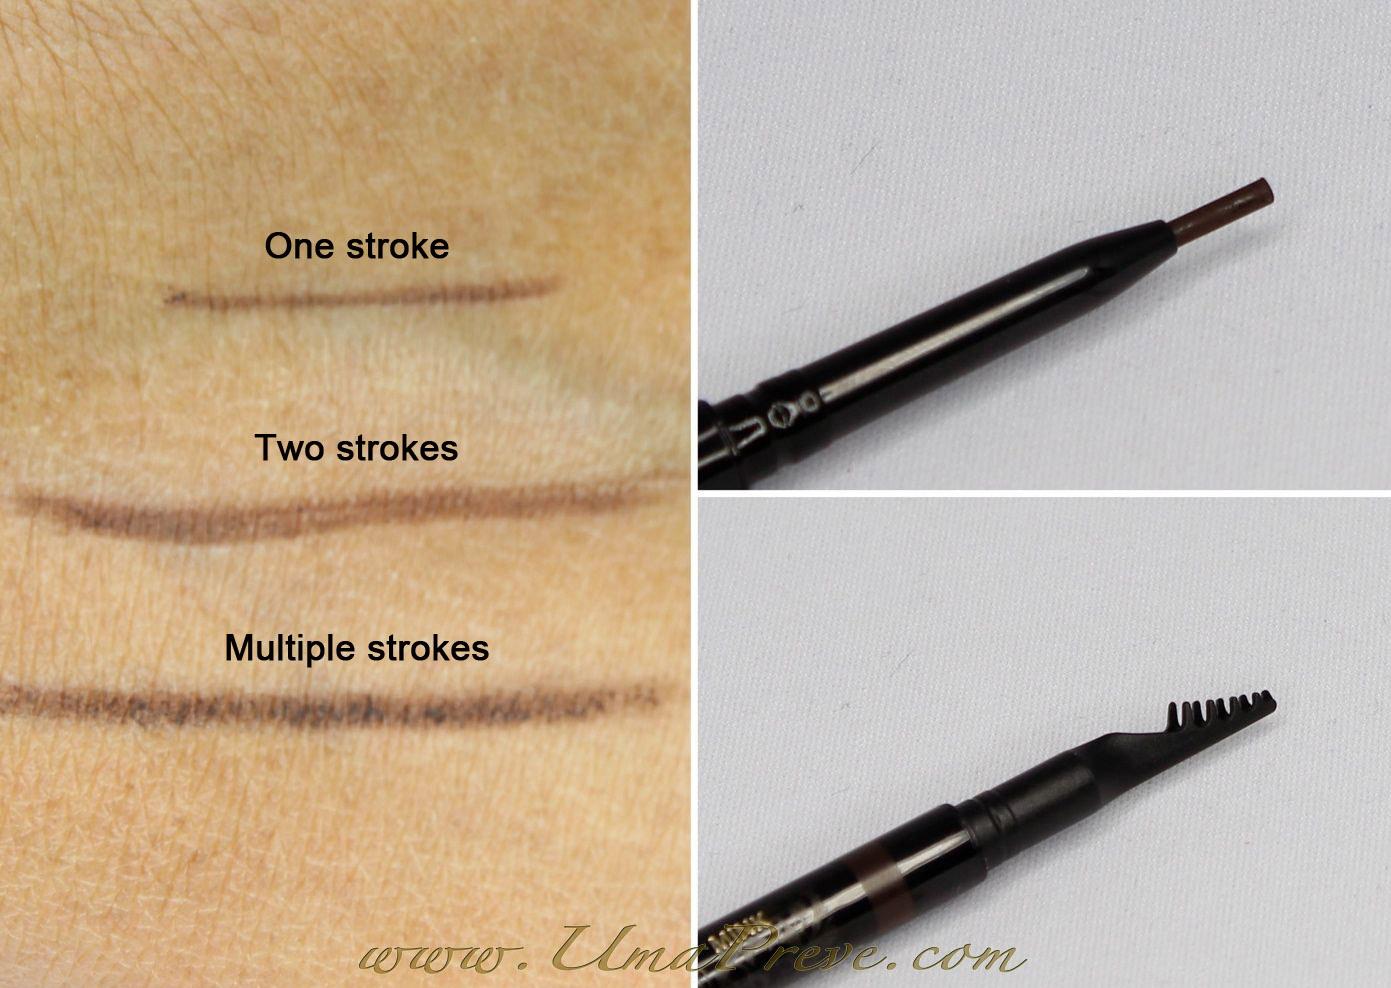 Umamakeuphdtv Senna Sketch A Brow Pencil Swatch And Review